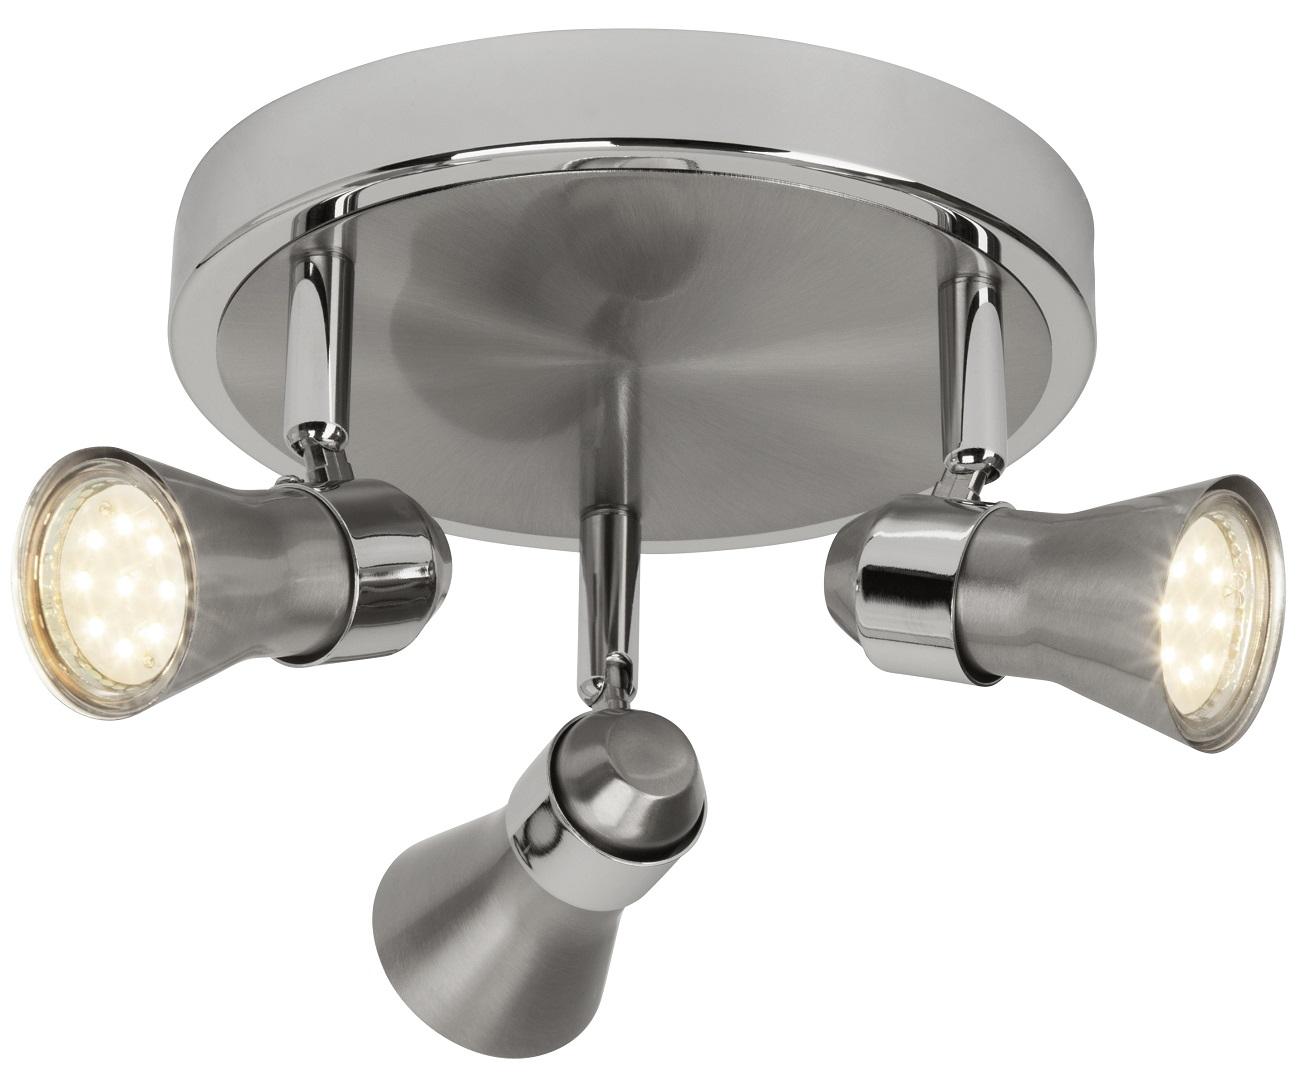 Plafondlamp Sonny 3xGU10 5Watt 3000K in chroom | Brilliant